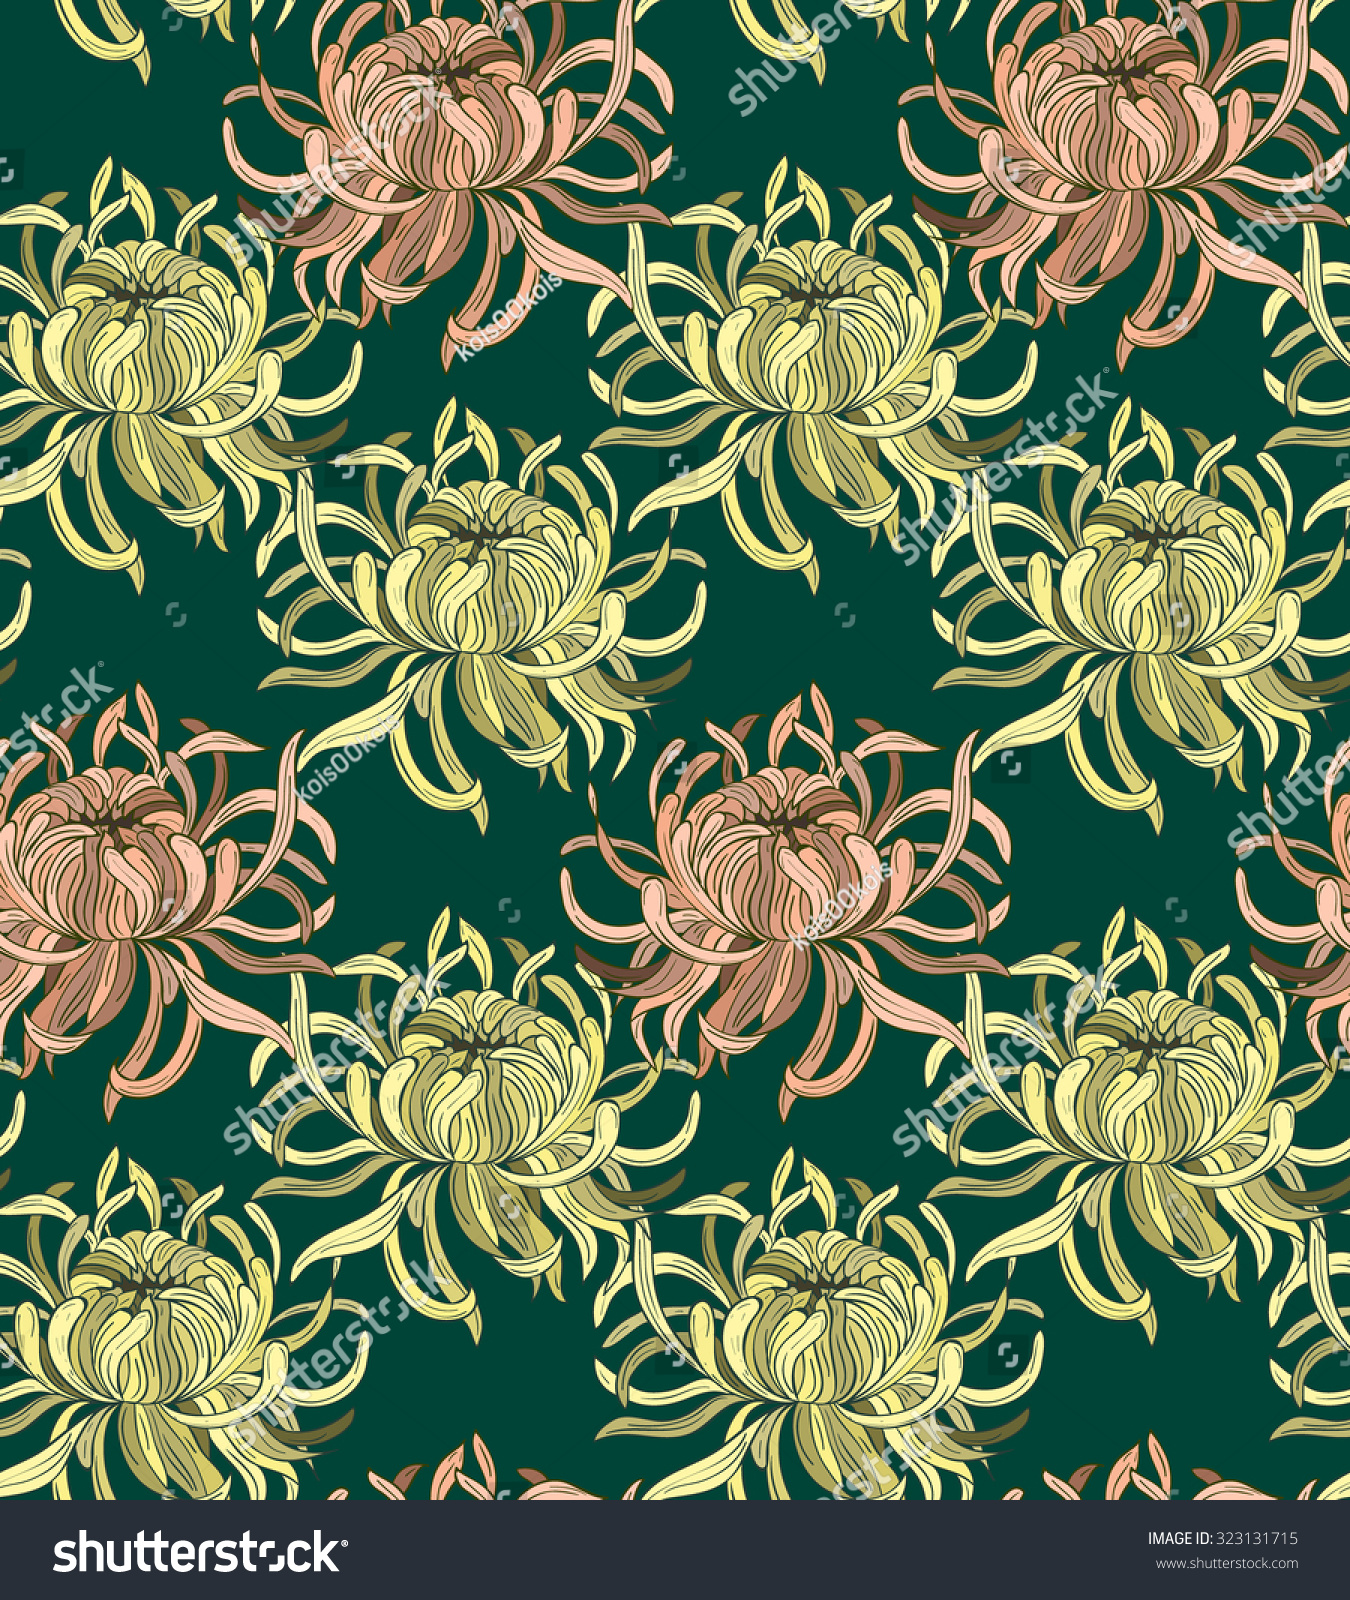 Pink floral seamless vector background floral hrysanthemum seamless - Chrysanthemum Flower Seamless Pattern On Blue Green Background Cloth Rug Design Pink